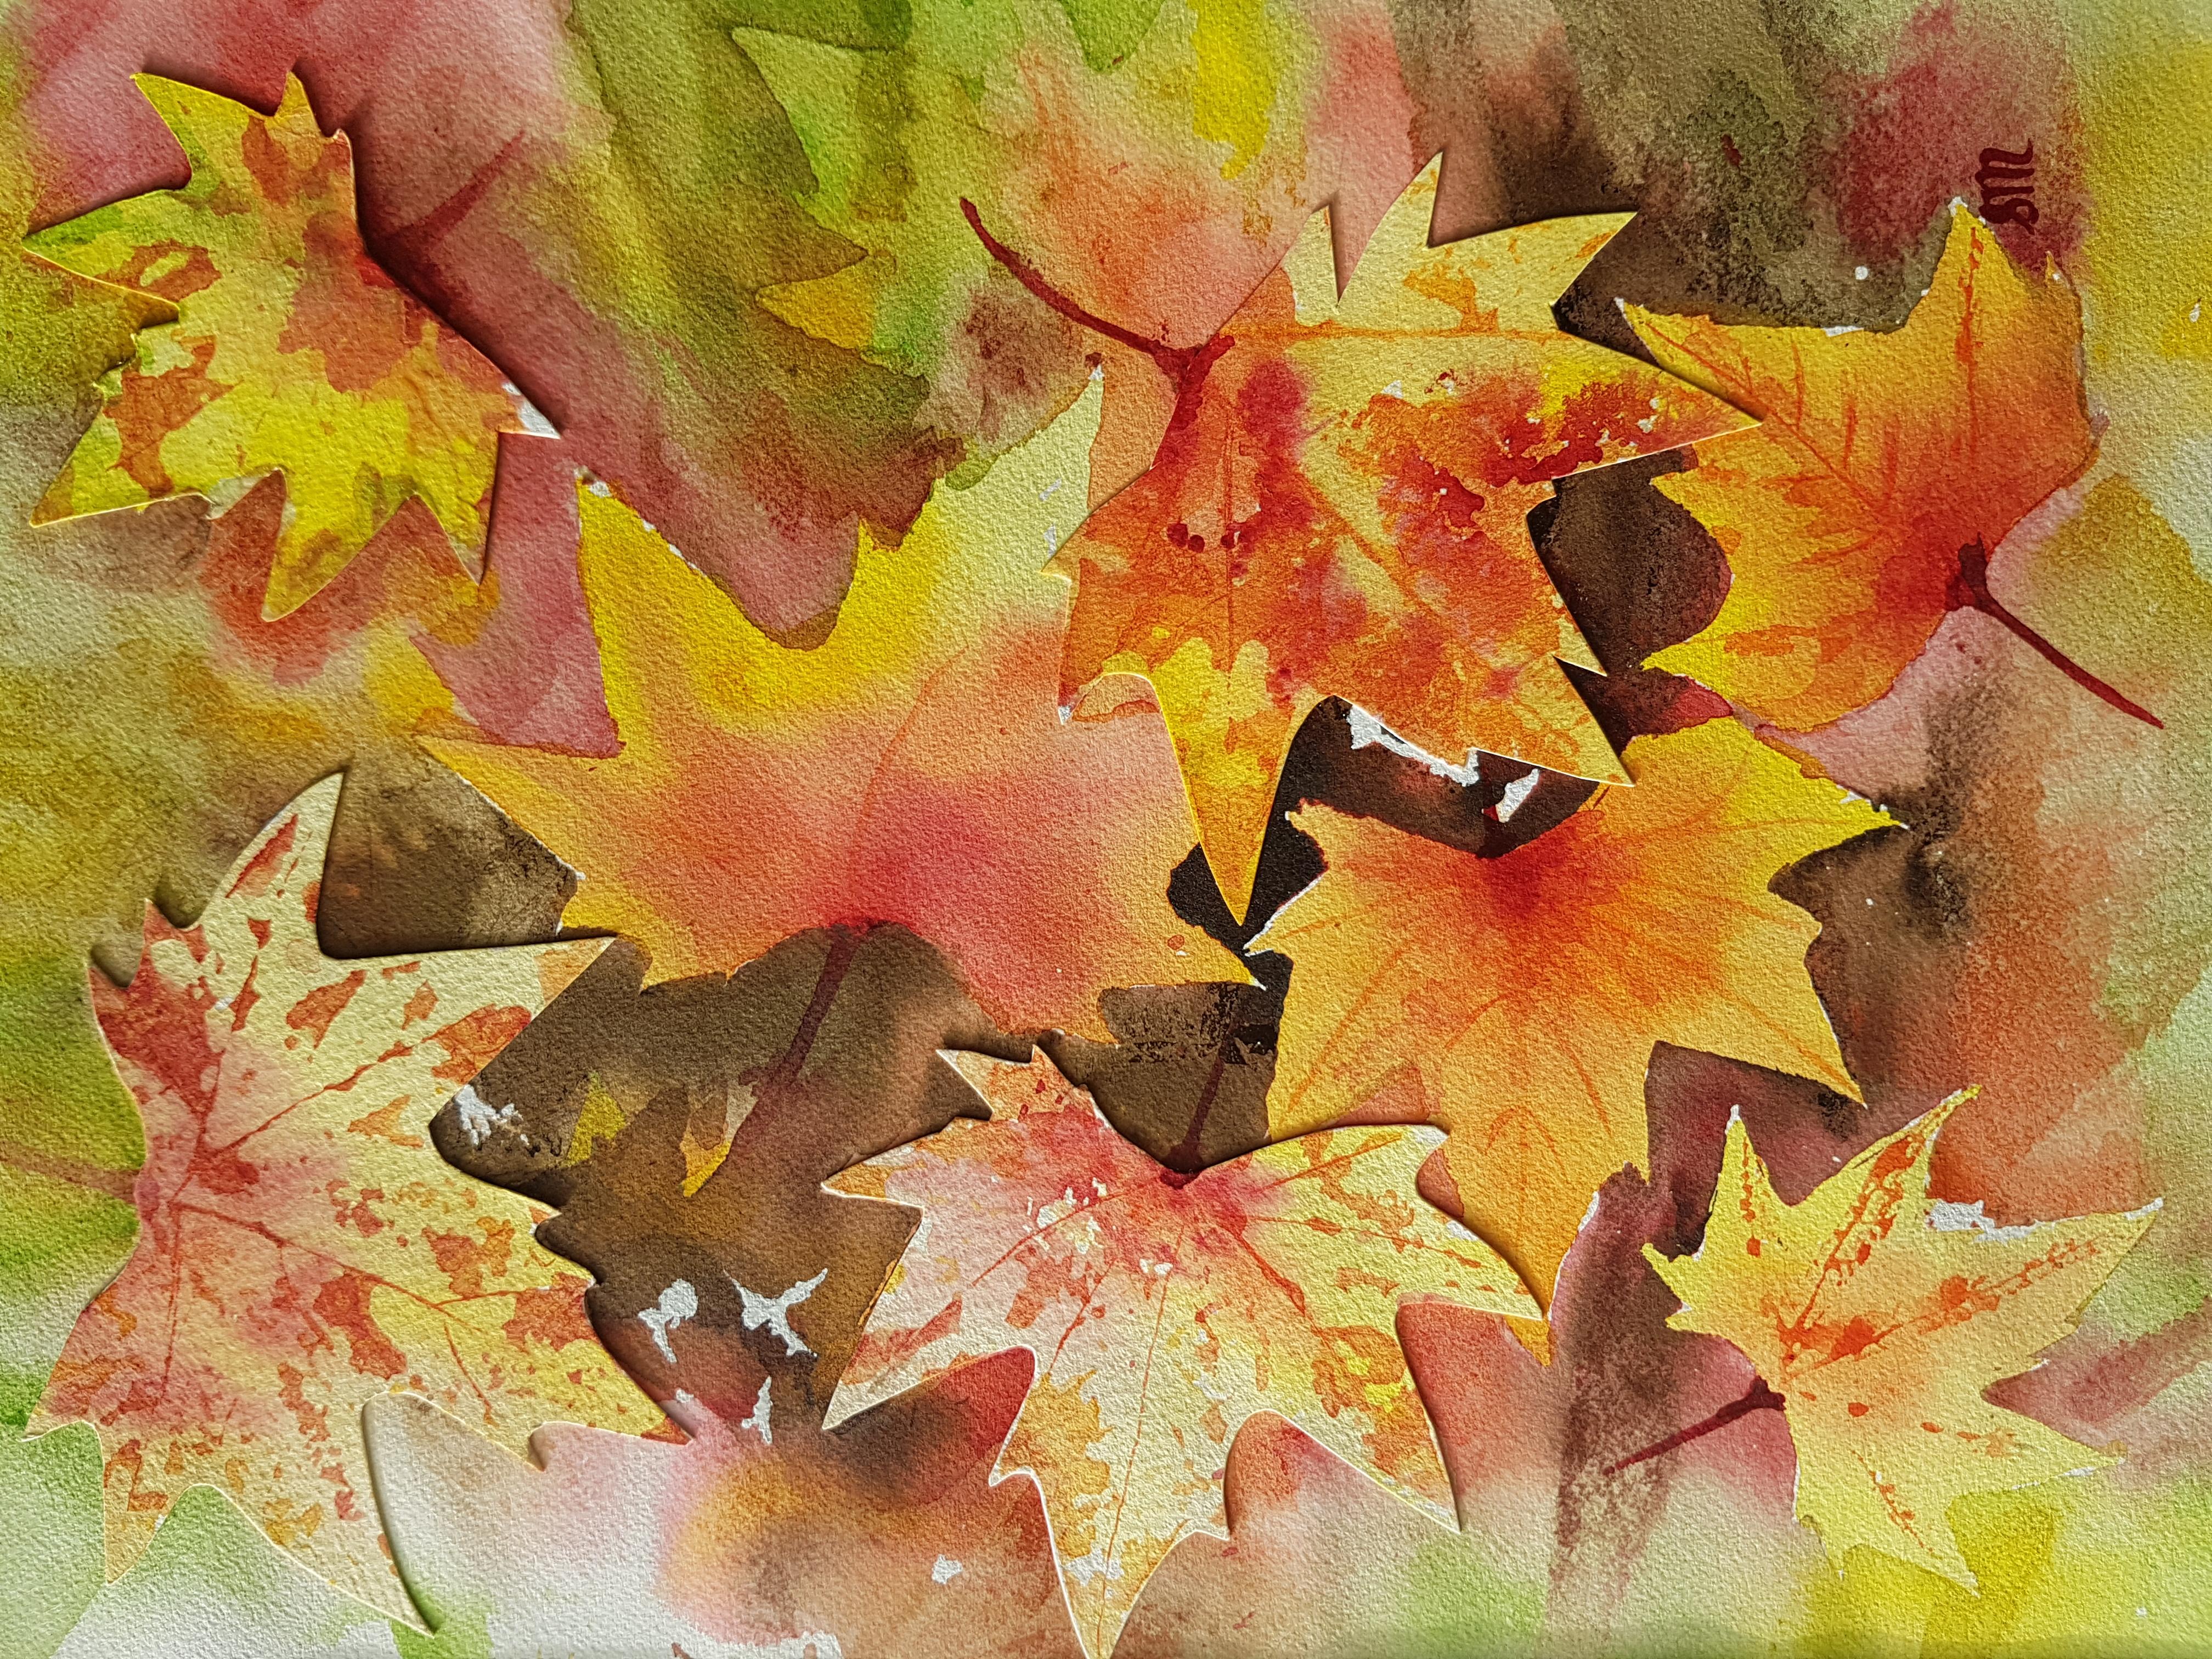 Fallen Autumn Leaves-Mix Media